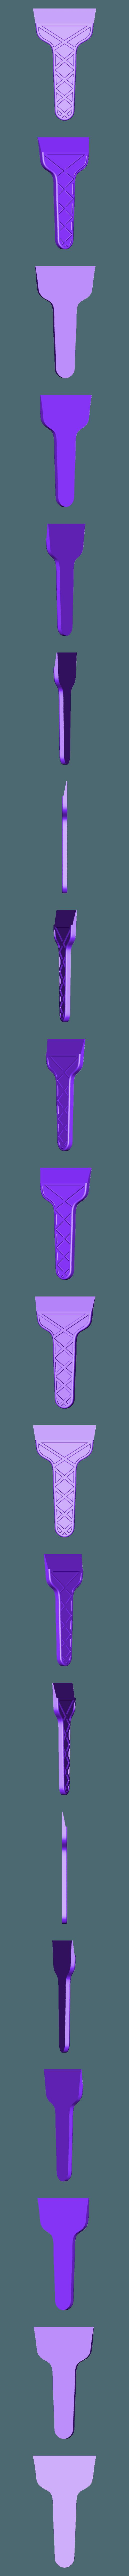 ice_scraper.stl Download free STL file Simple Ice Scraper • 3D print object, NikodemBartnik